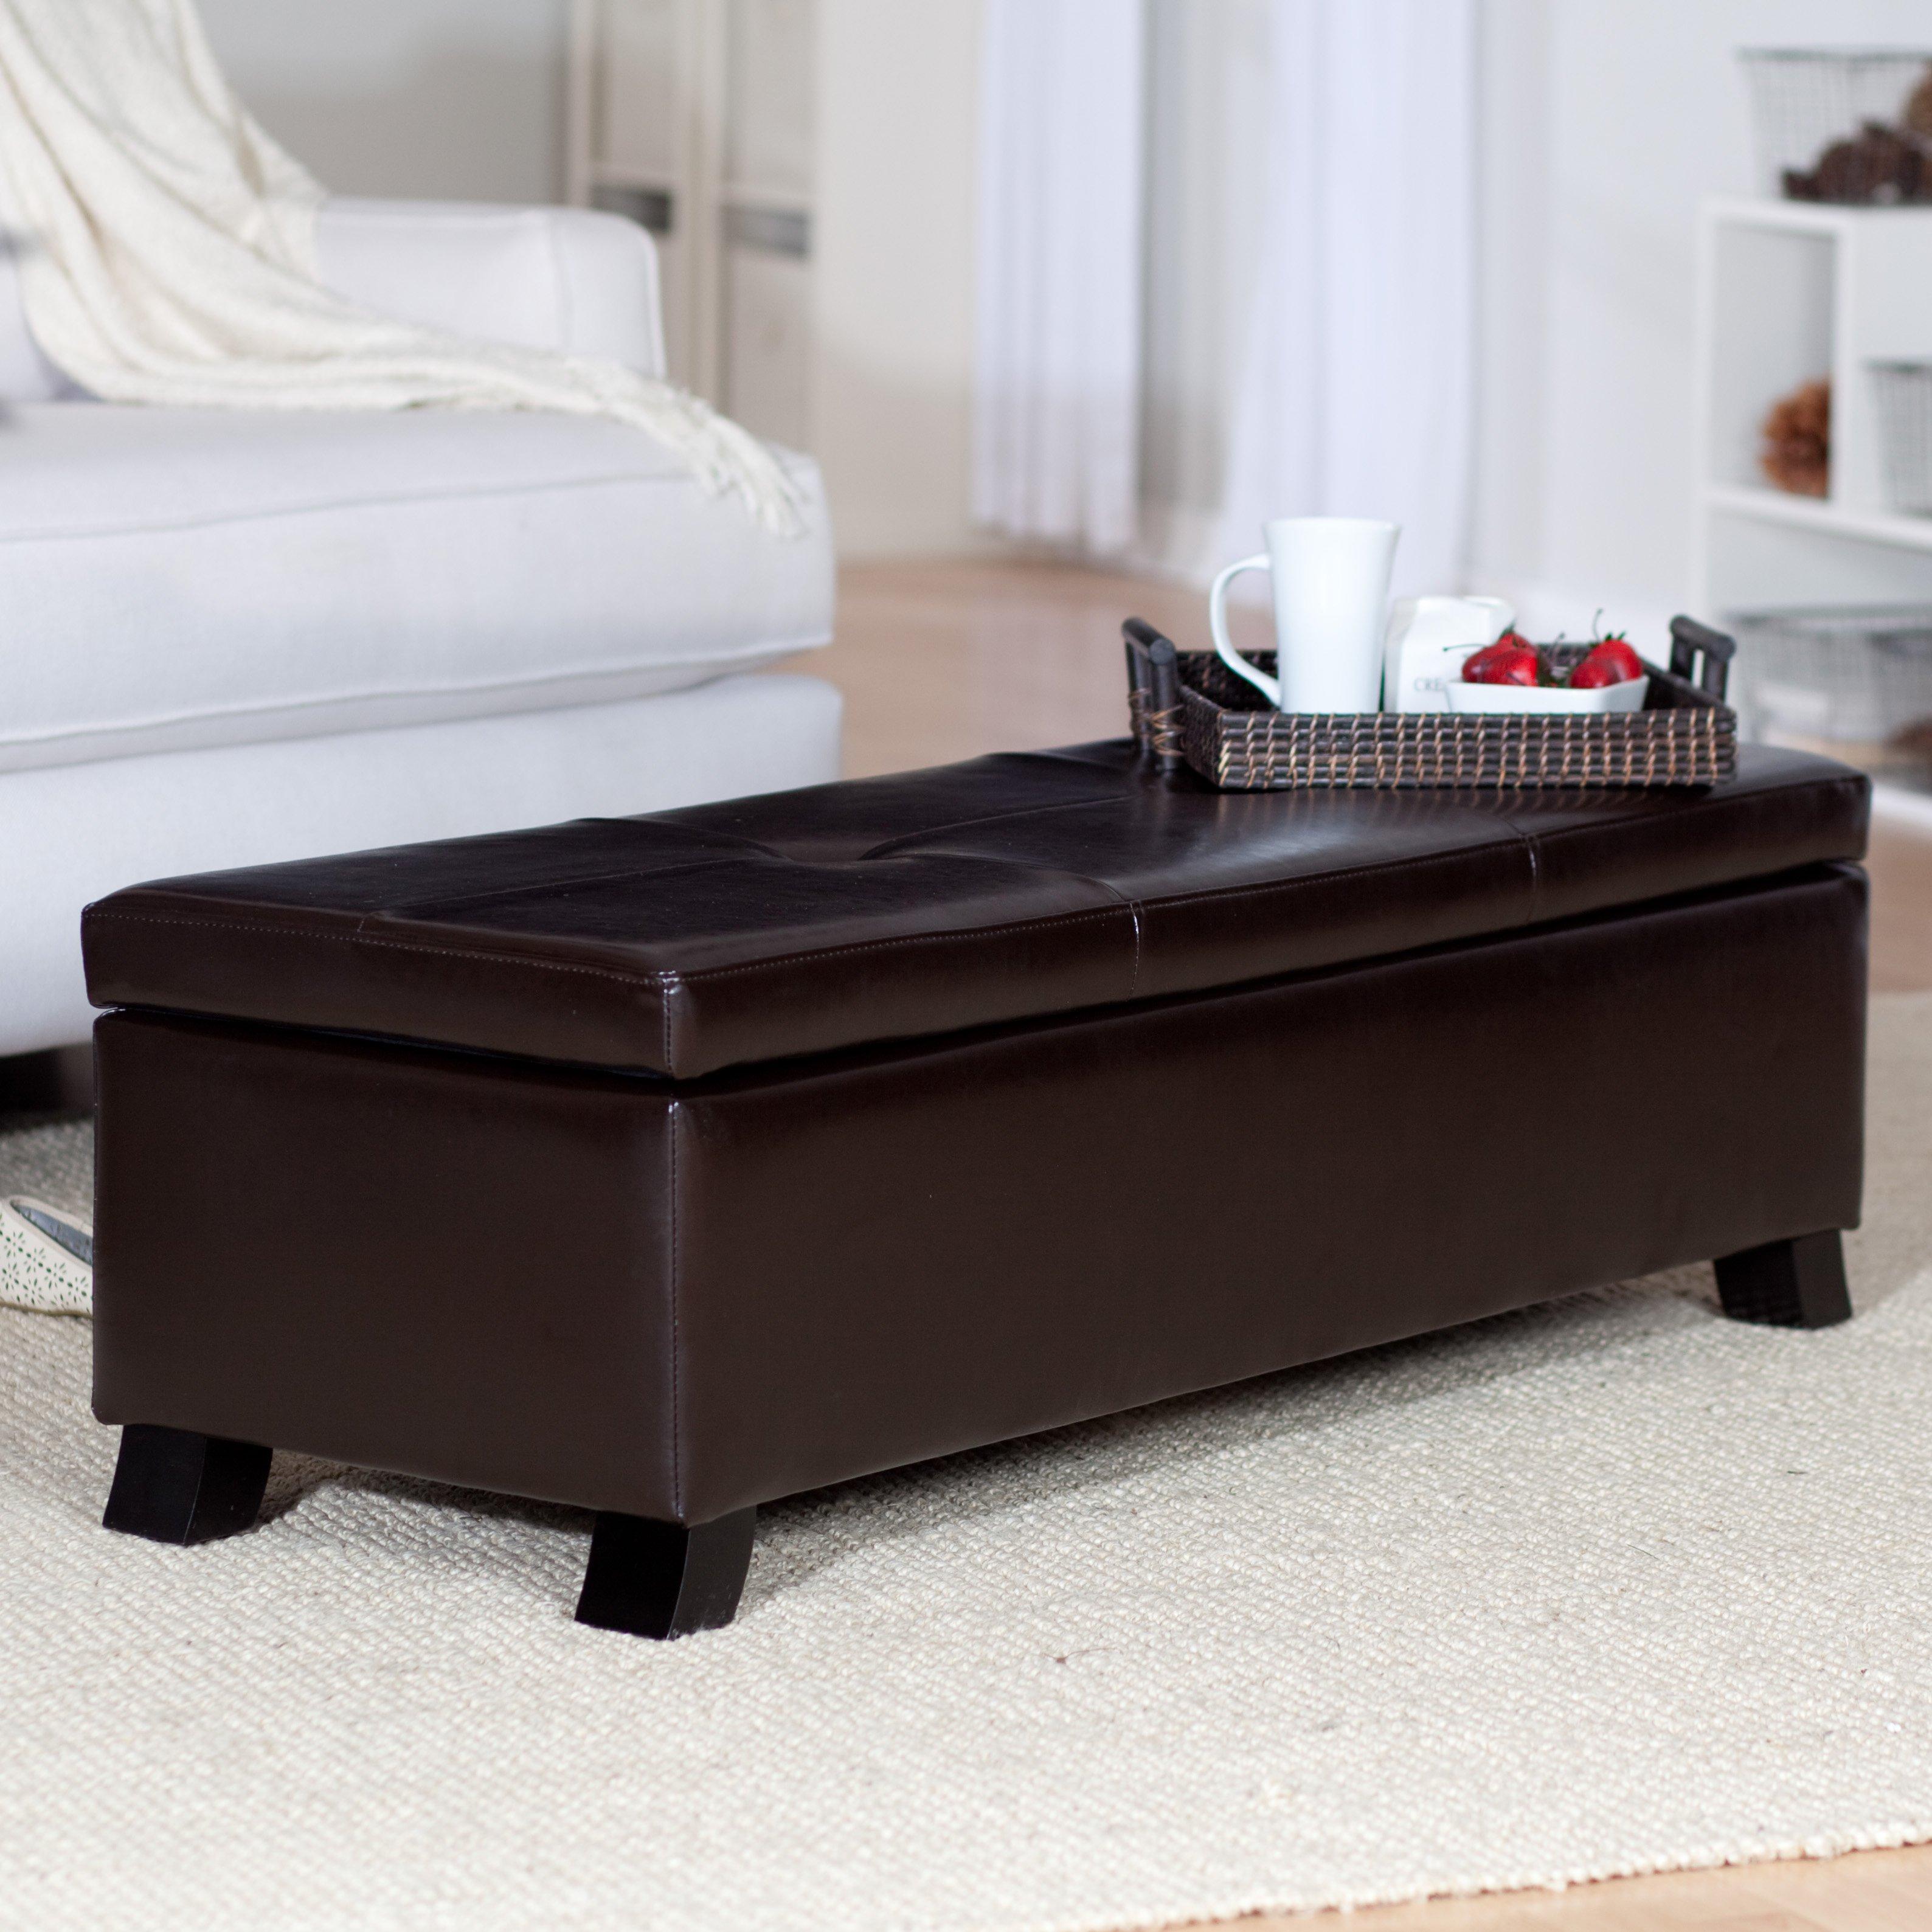 crawford leather storage bench ottoman  walmartcom -